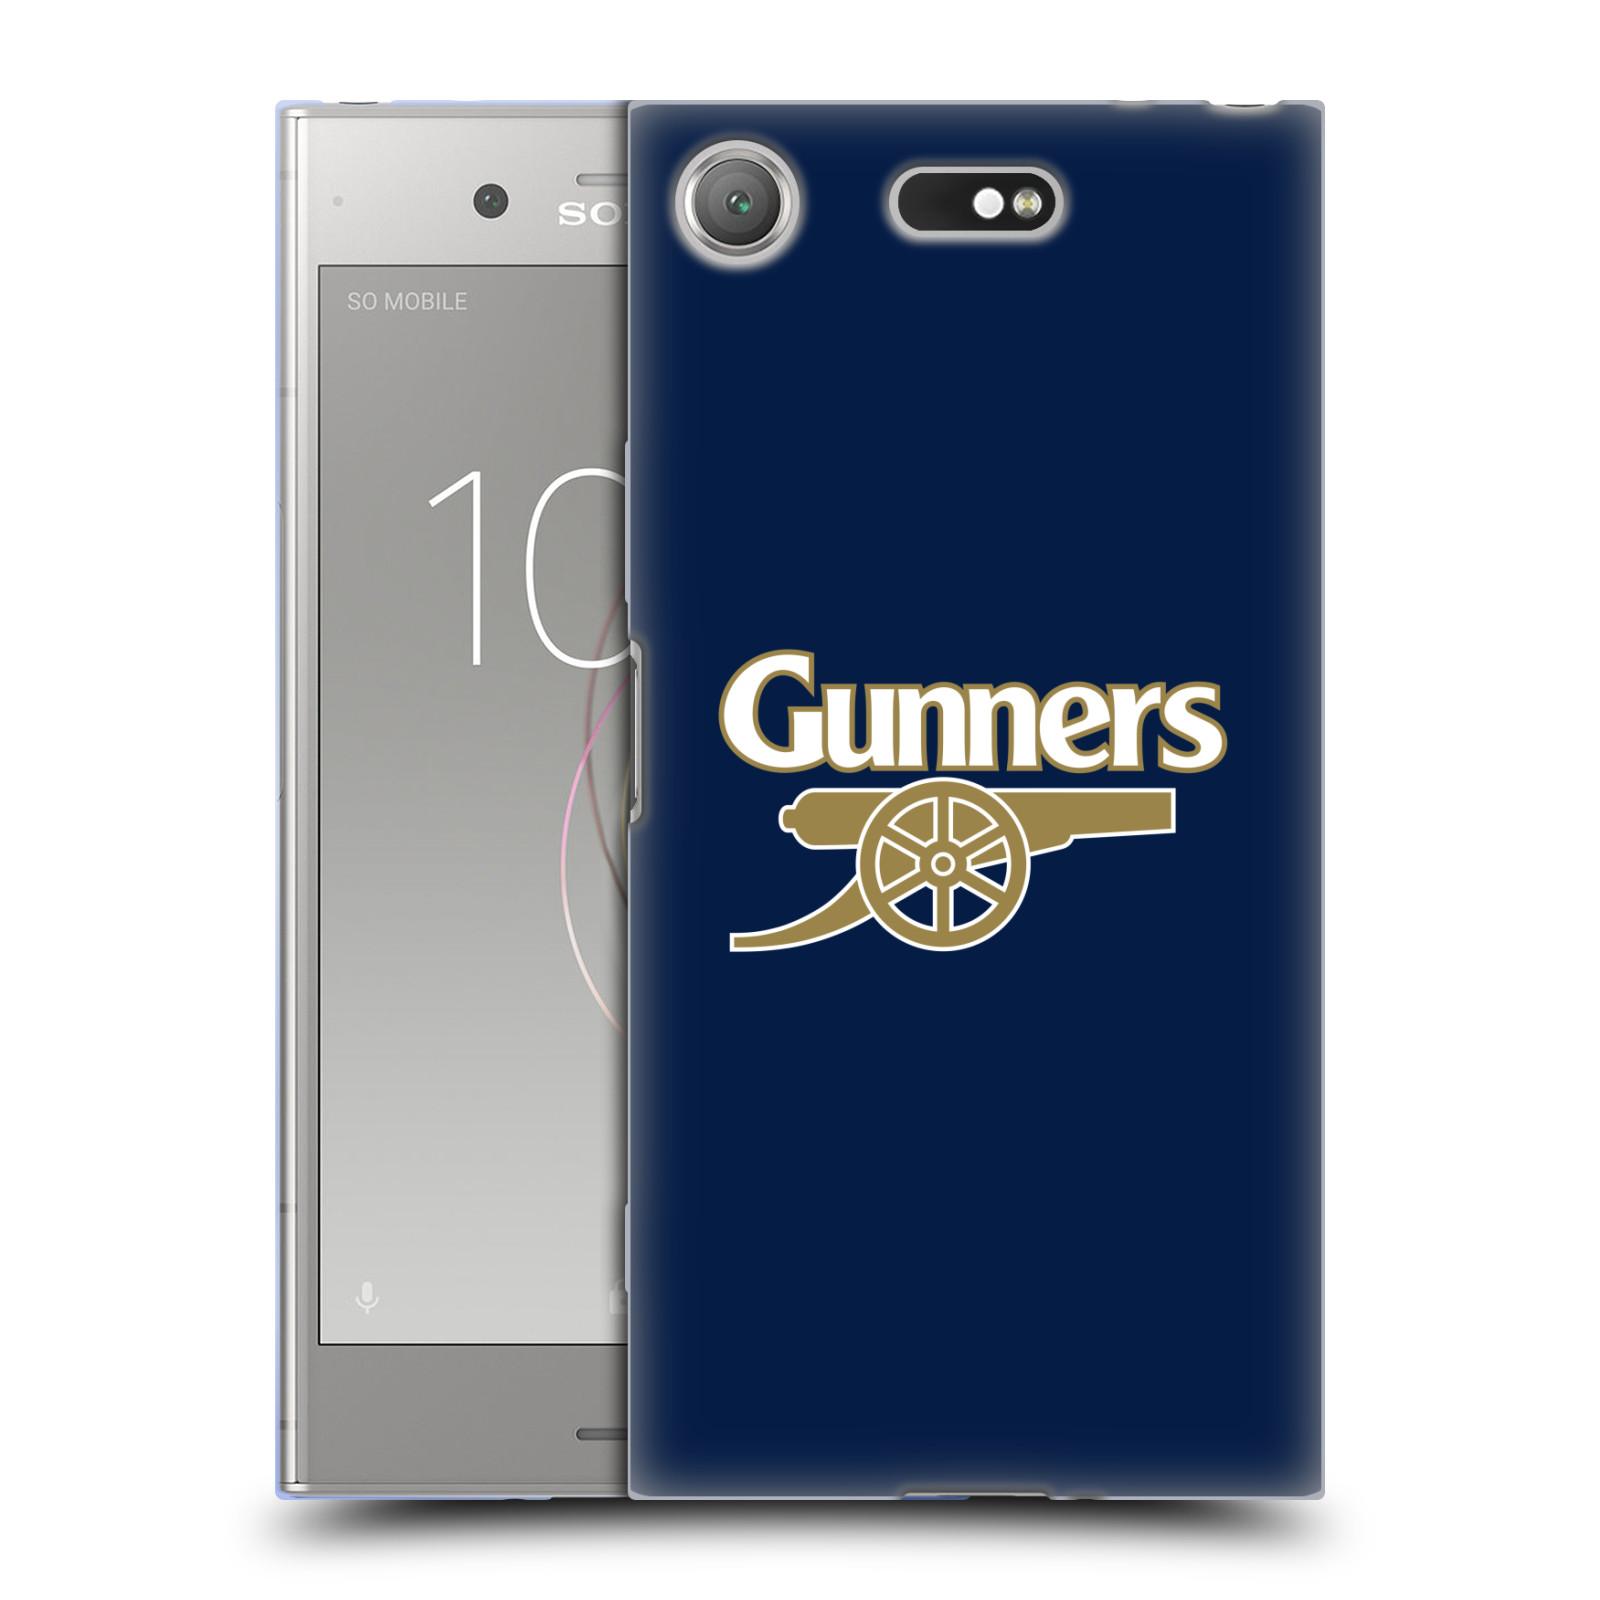 Silikonové pouzdro na mobil Sony Xperia XZ1 Compact - Head Case - Arsenal FC - Gunners